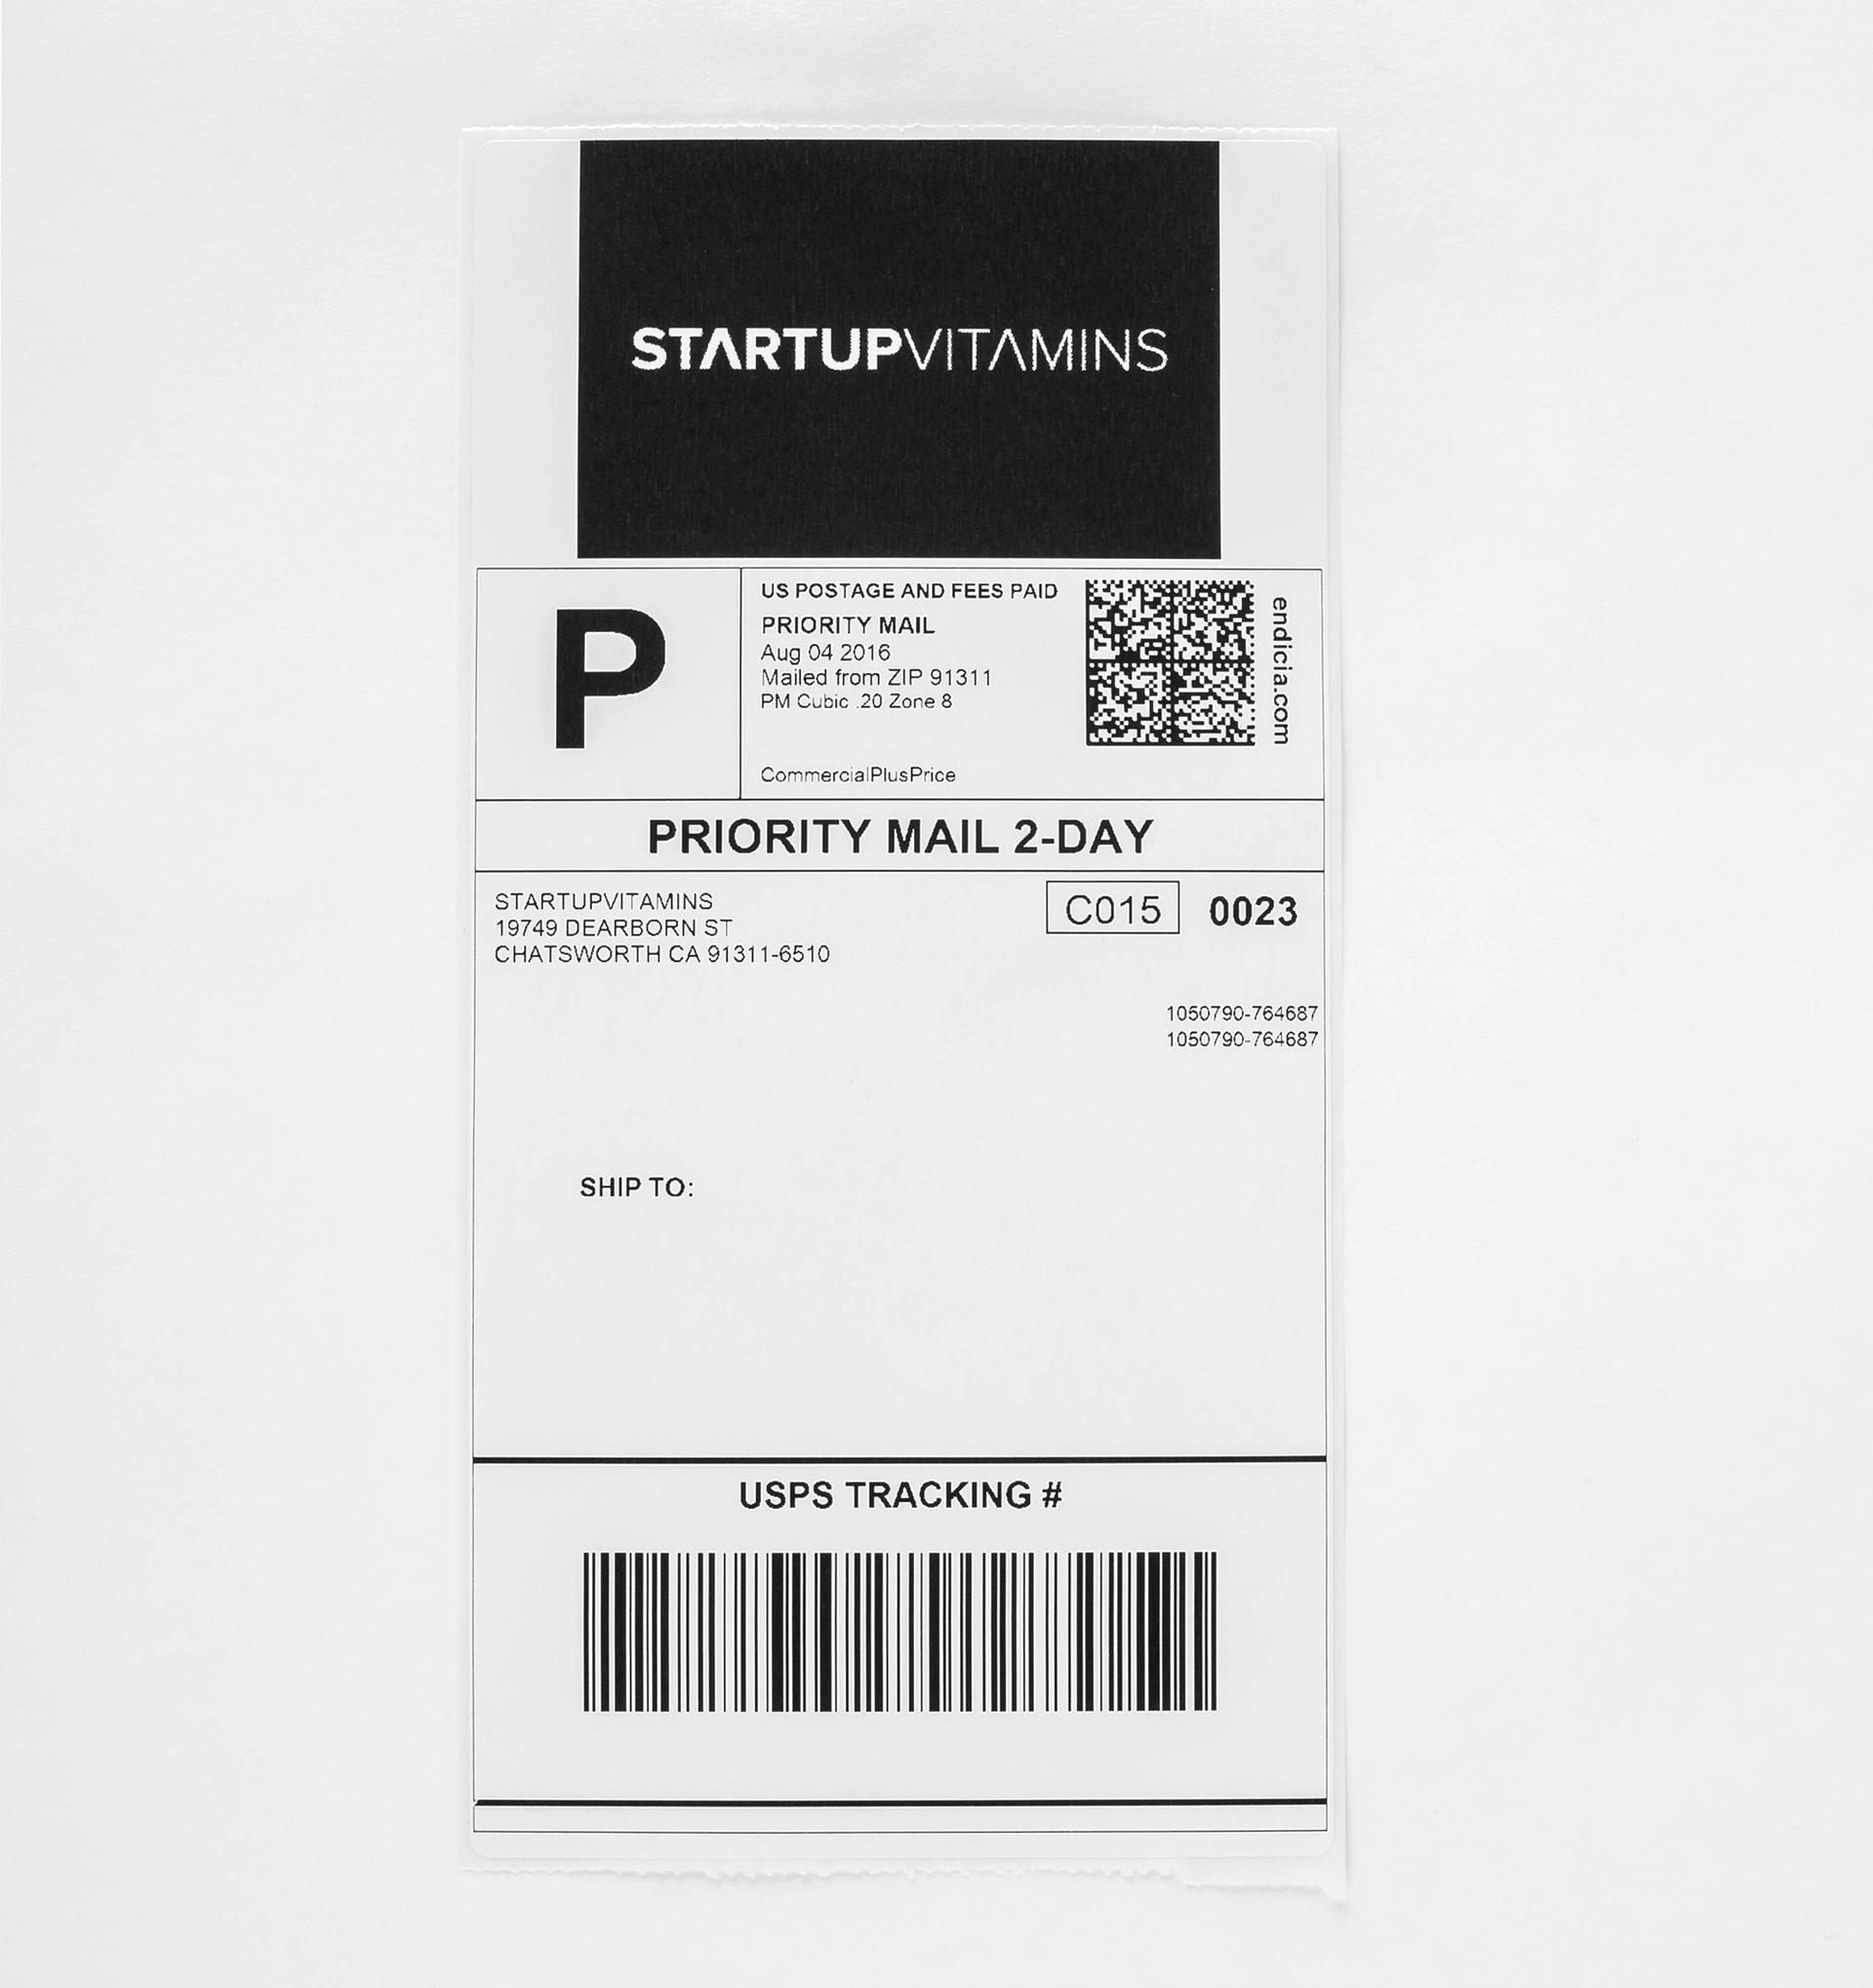 Printful branding on label